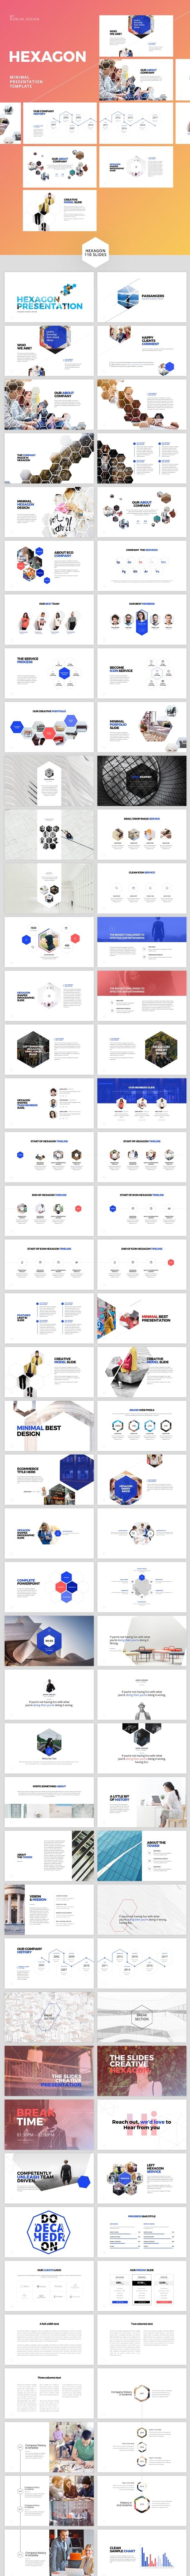 Hexagon-Powerpoint Template - Creative PowerPoint Templates